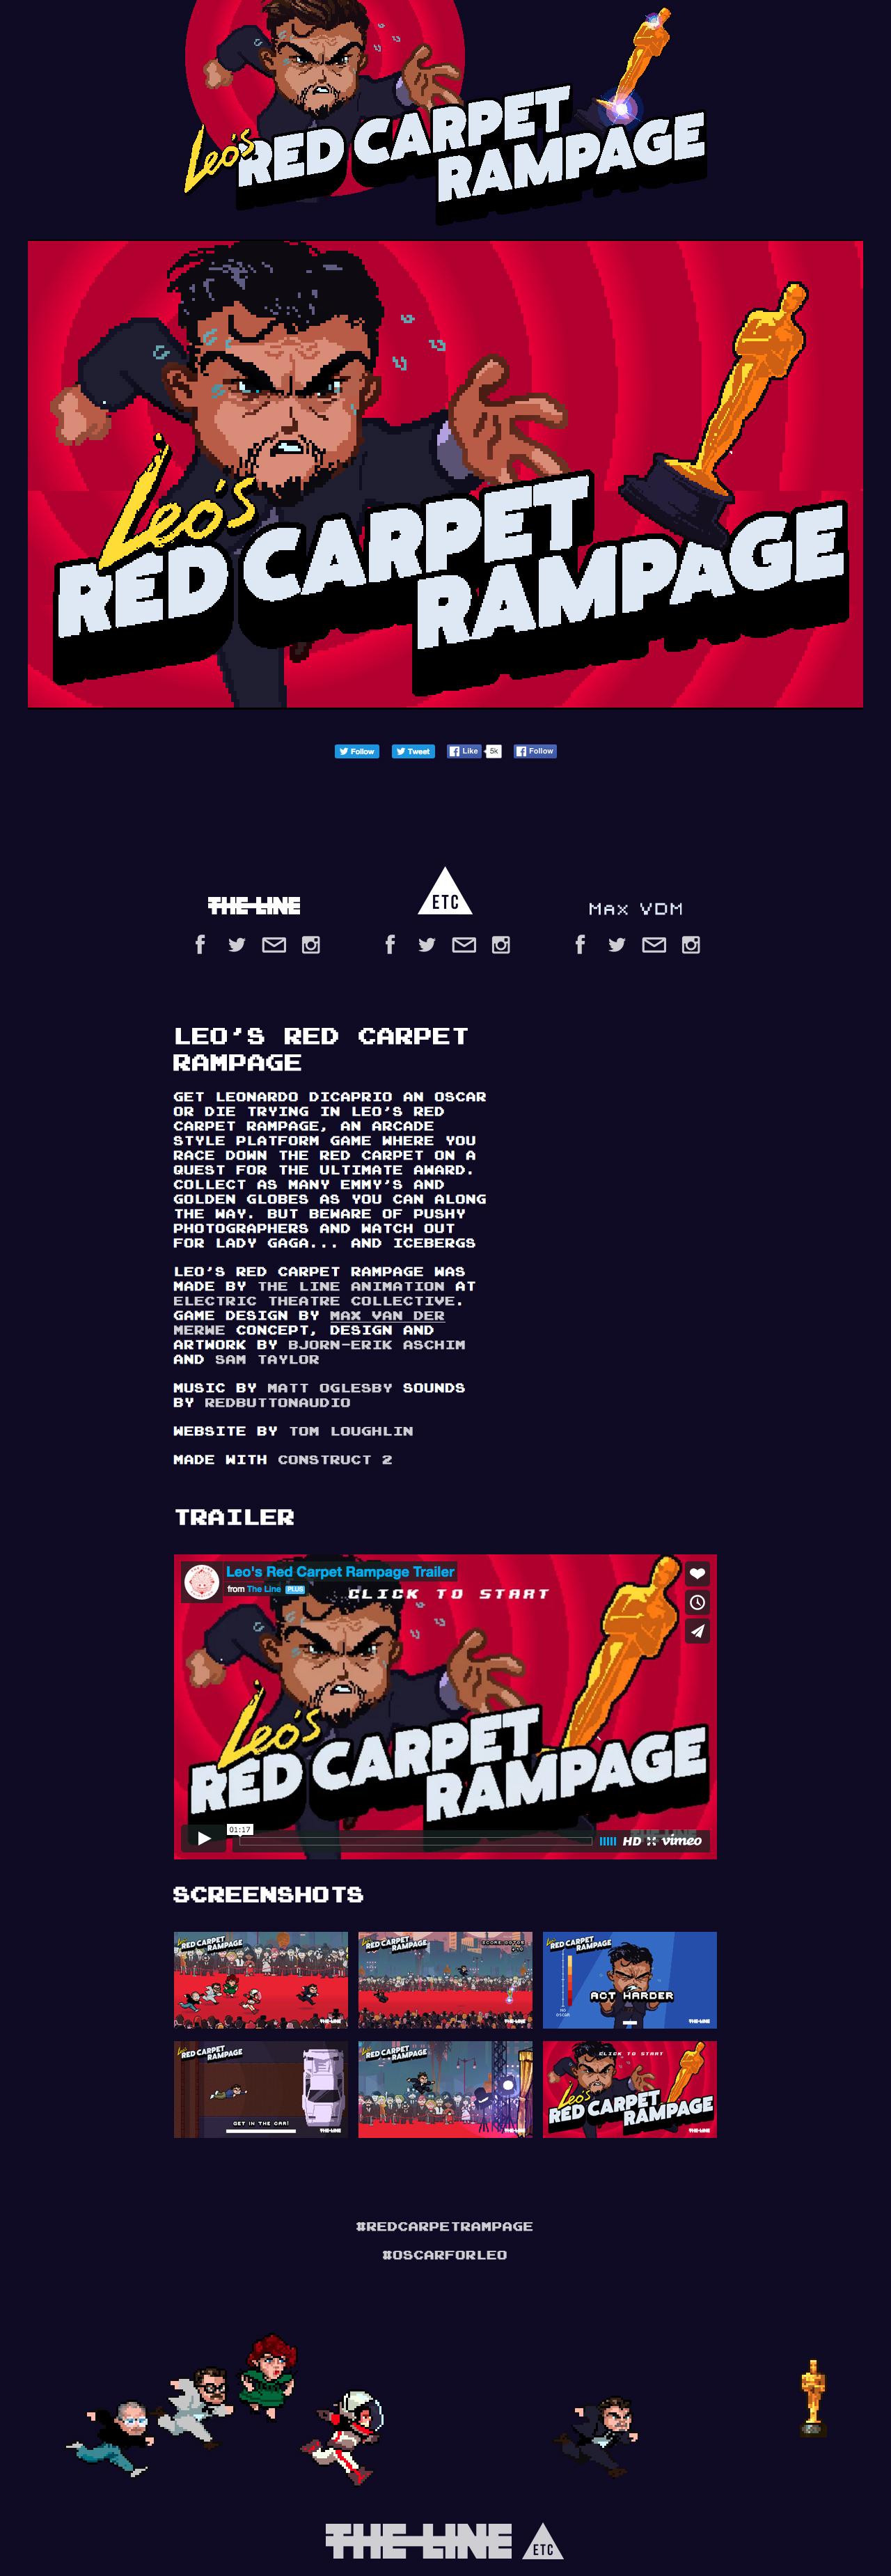 Leo's Red Carpet Rampage Website Screenshot